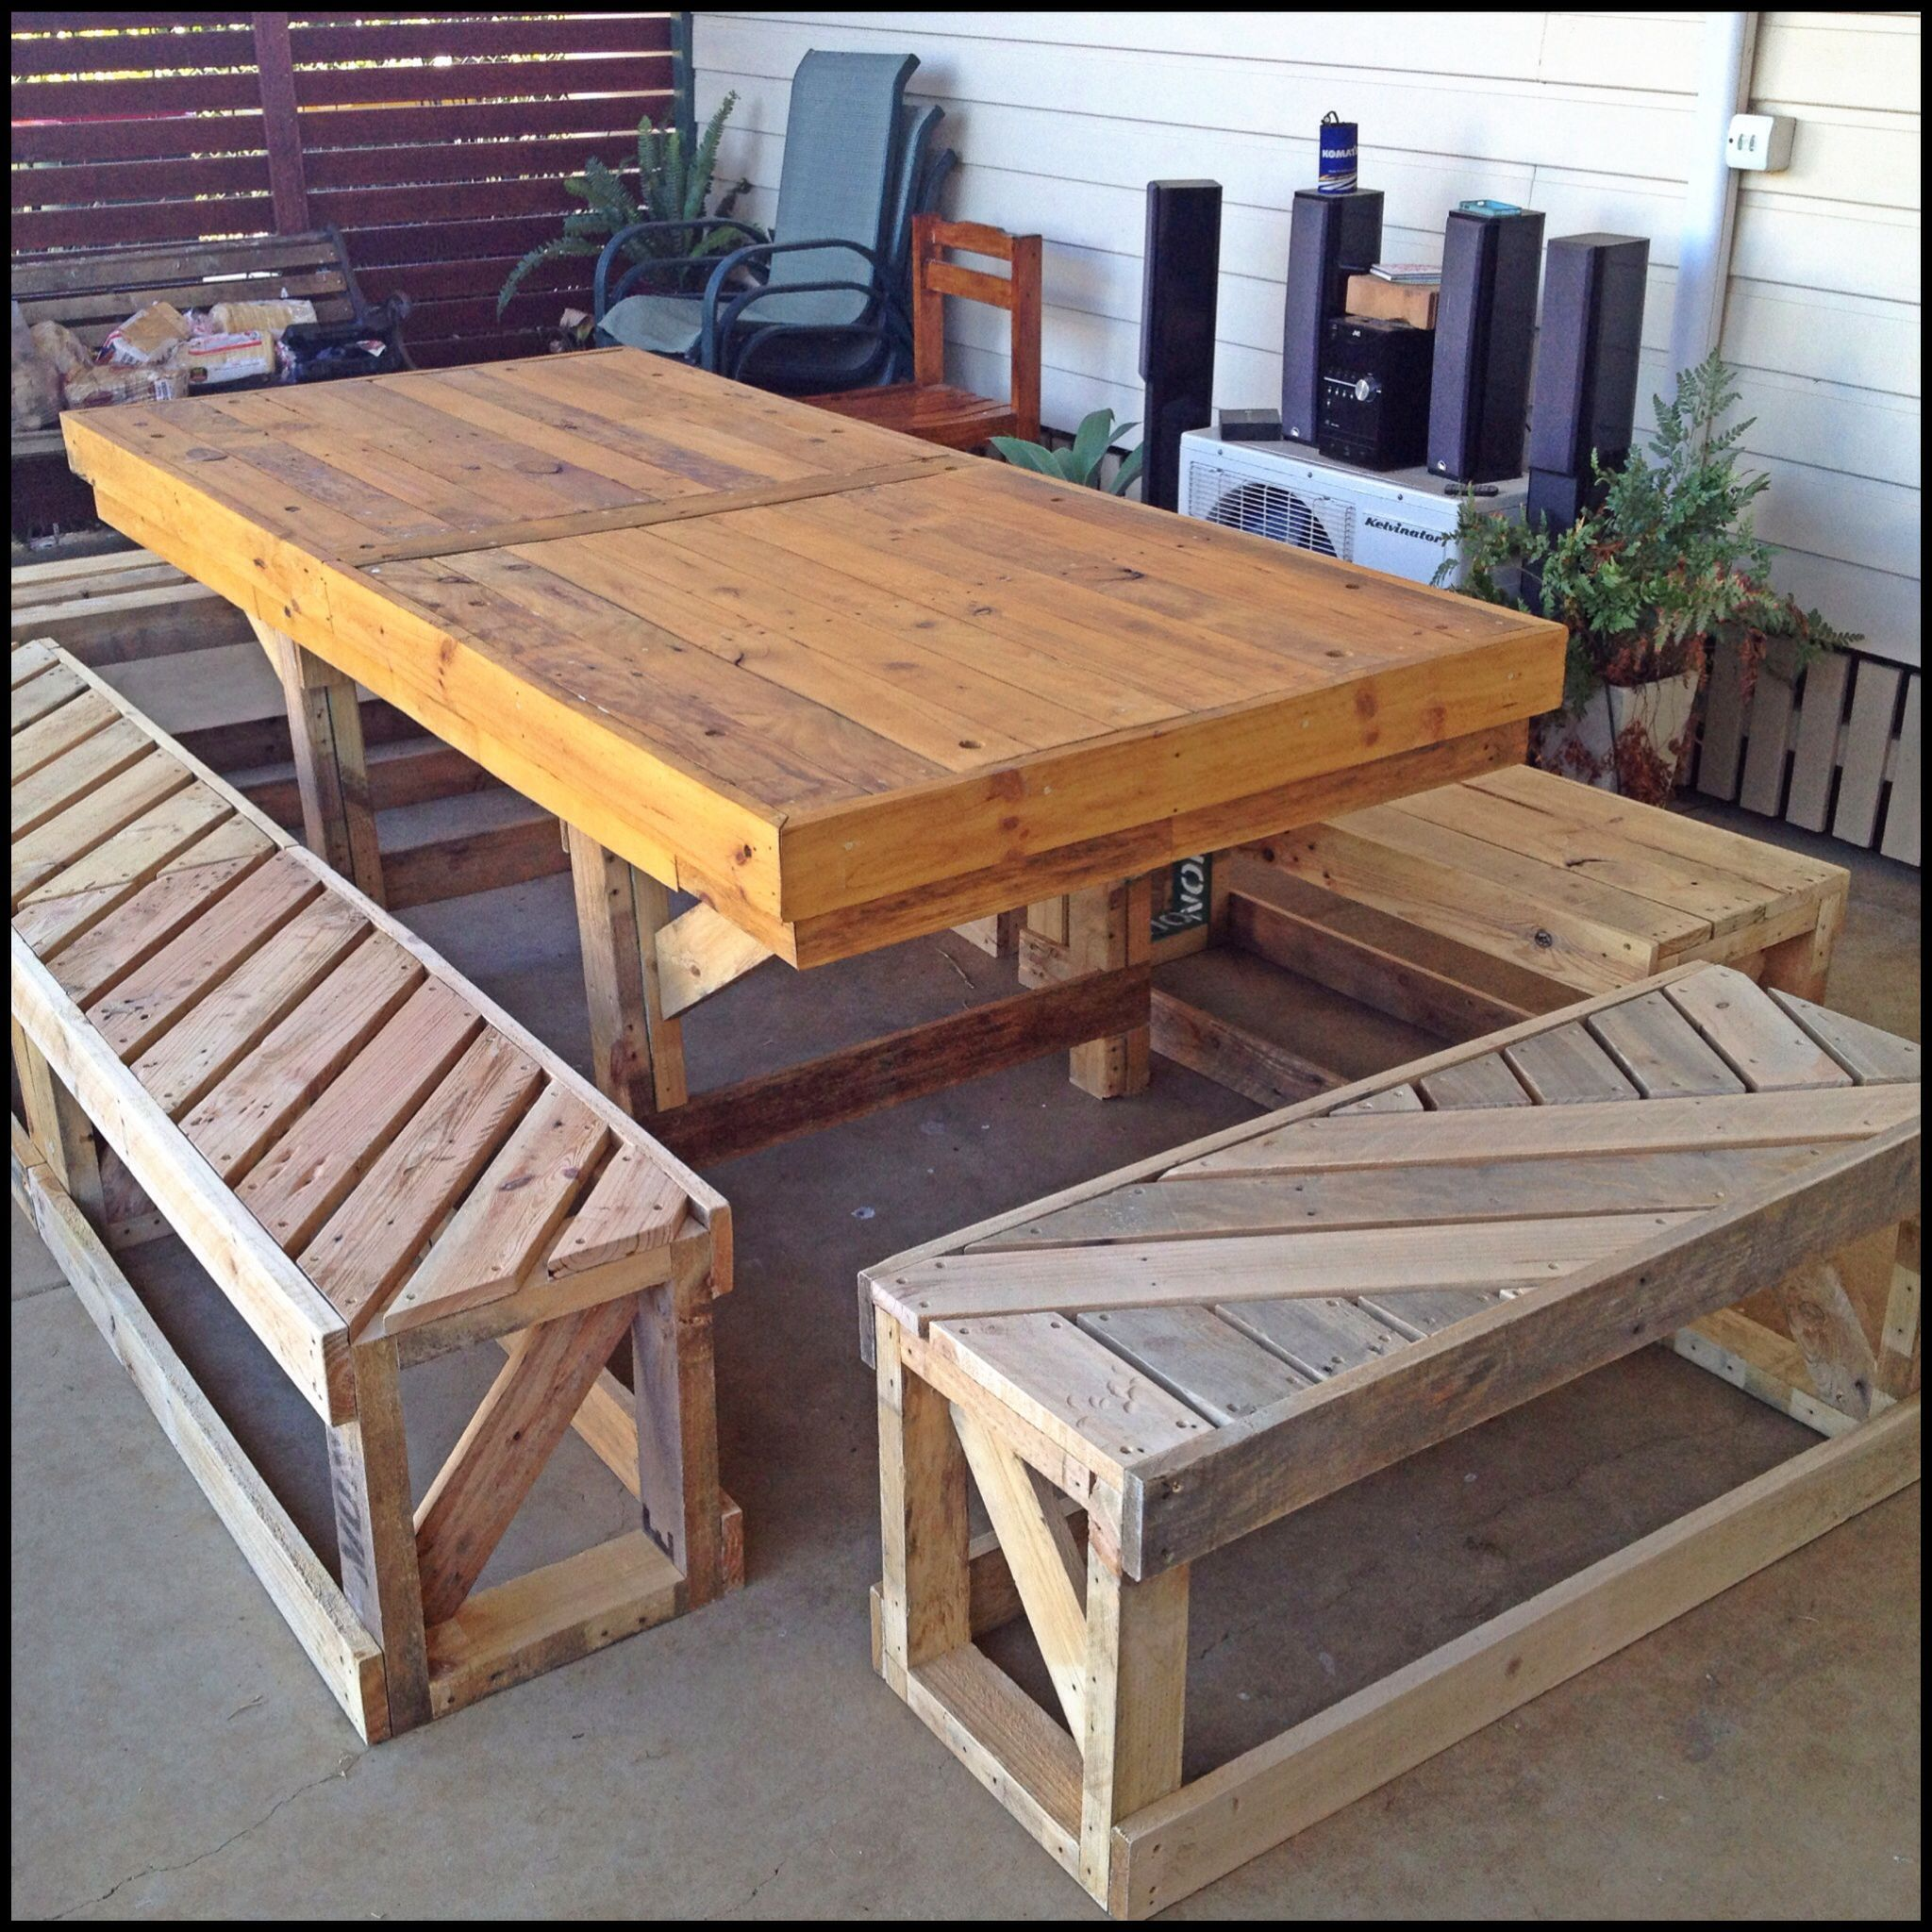 Full setting made from recycled pallets holzarbeiten - Holzpaletten gartenmobel ...